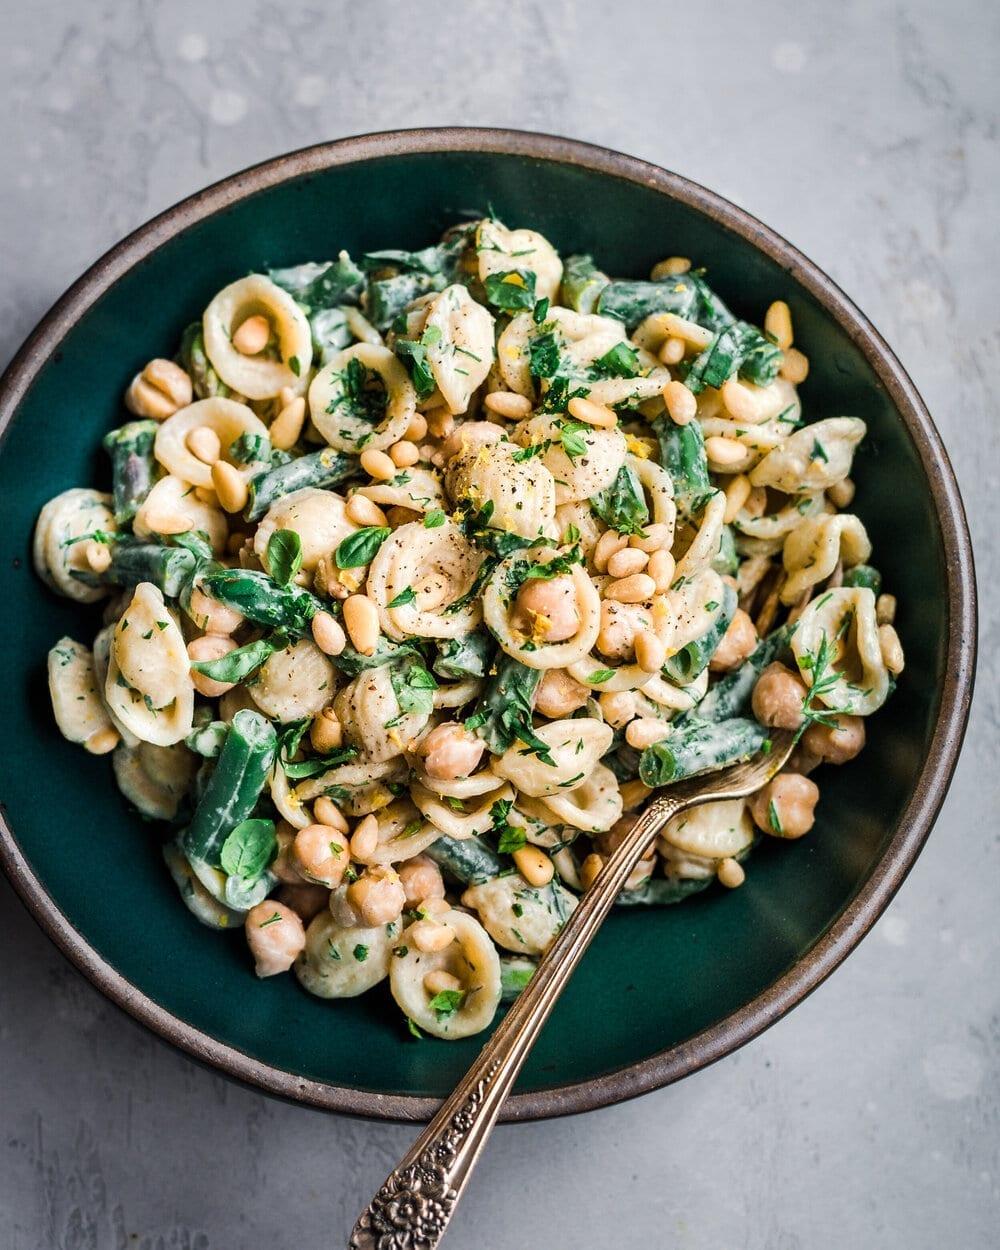 10 Creamy Vegan Pasta Recipes. vegan pasta salad. vegan tahini pasta salad.